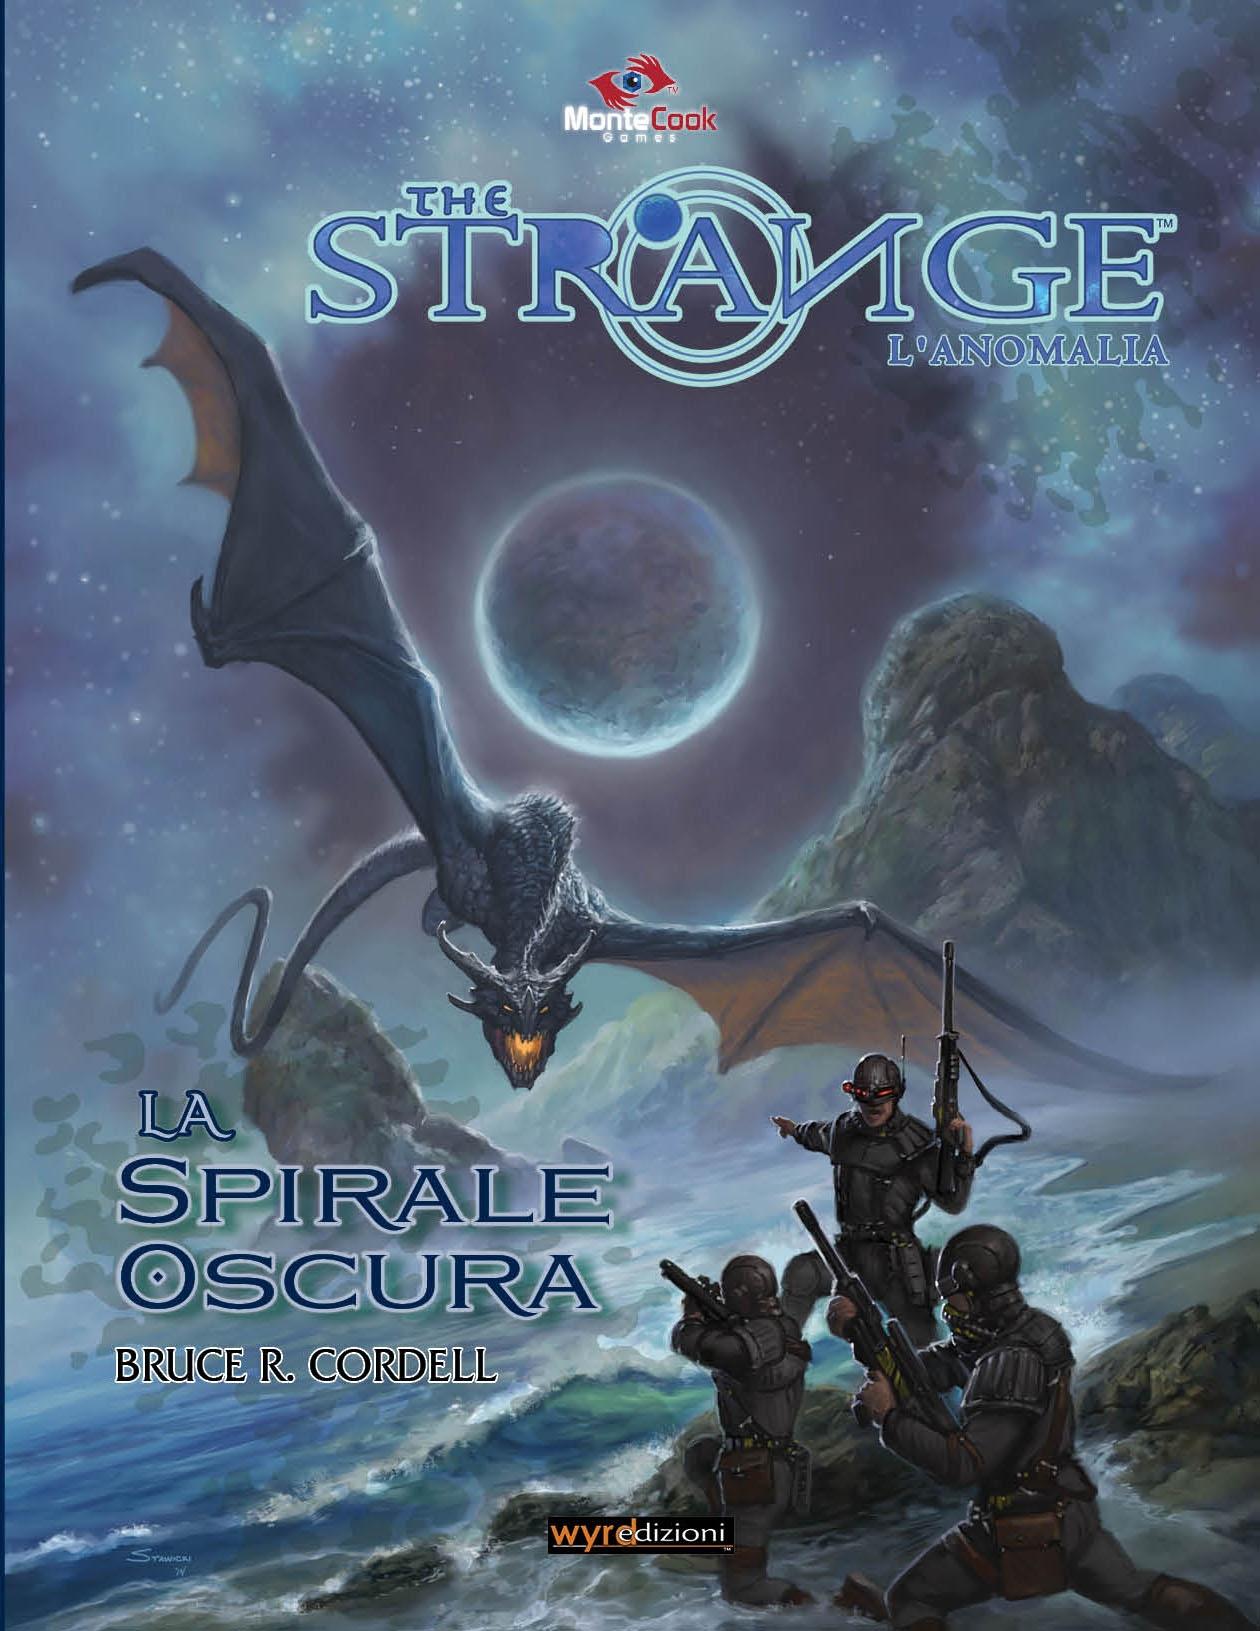 The Strange - La Spirale Oscura